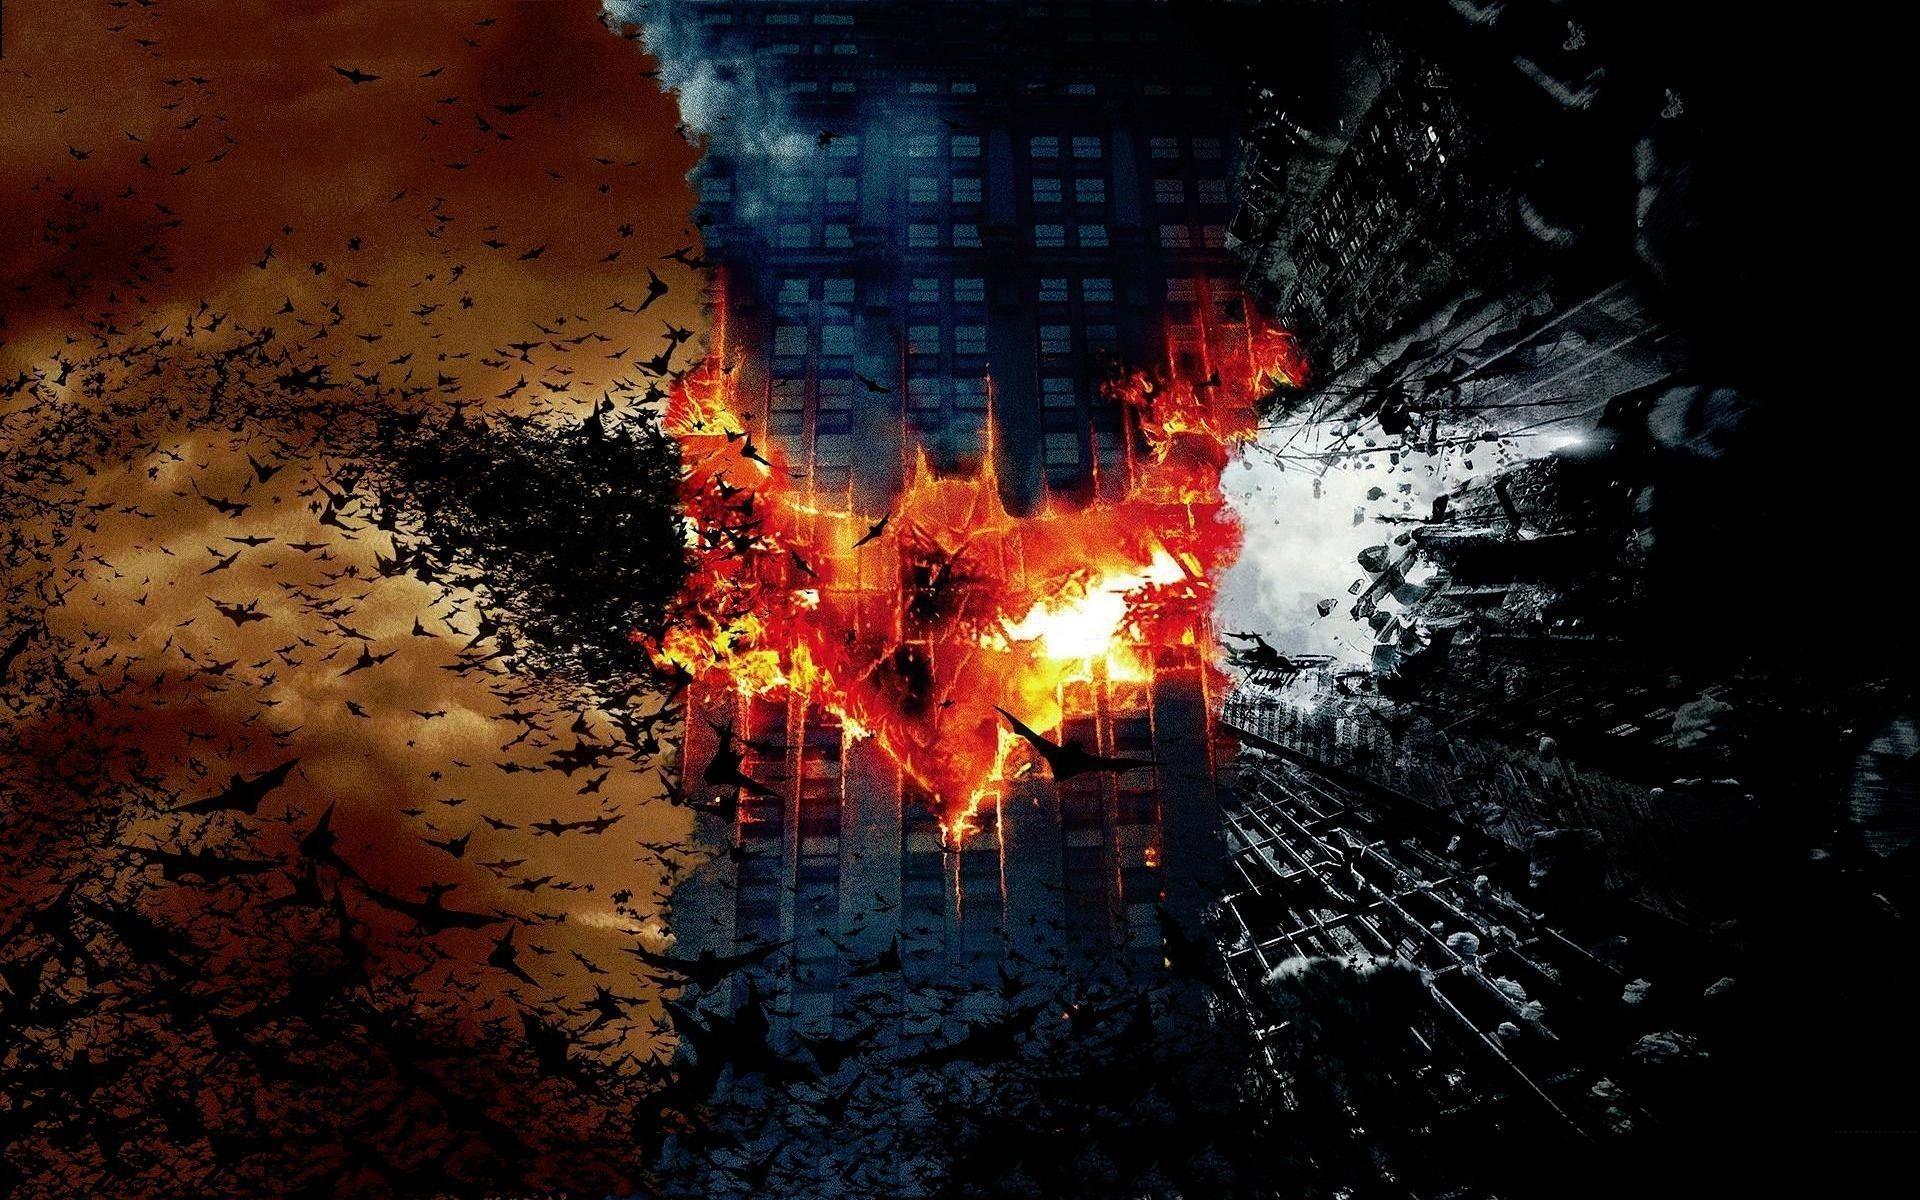 9 Batman Begins Wallpapers | Batman Begins Backgrounds